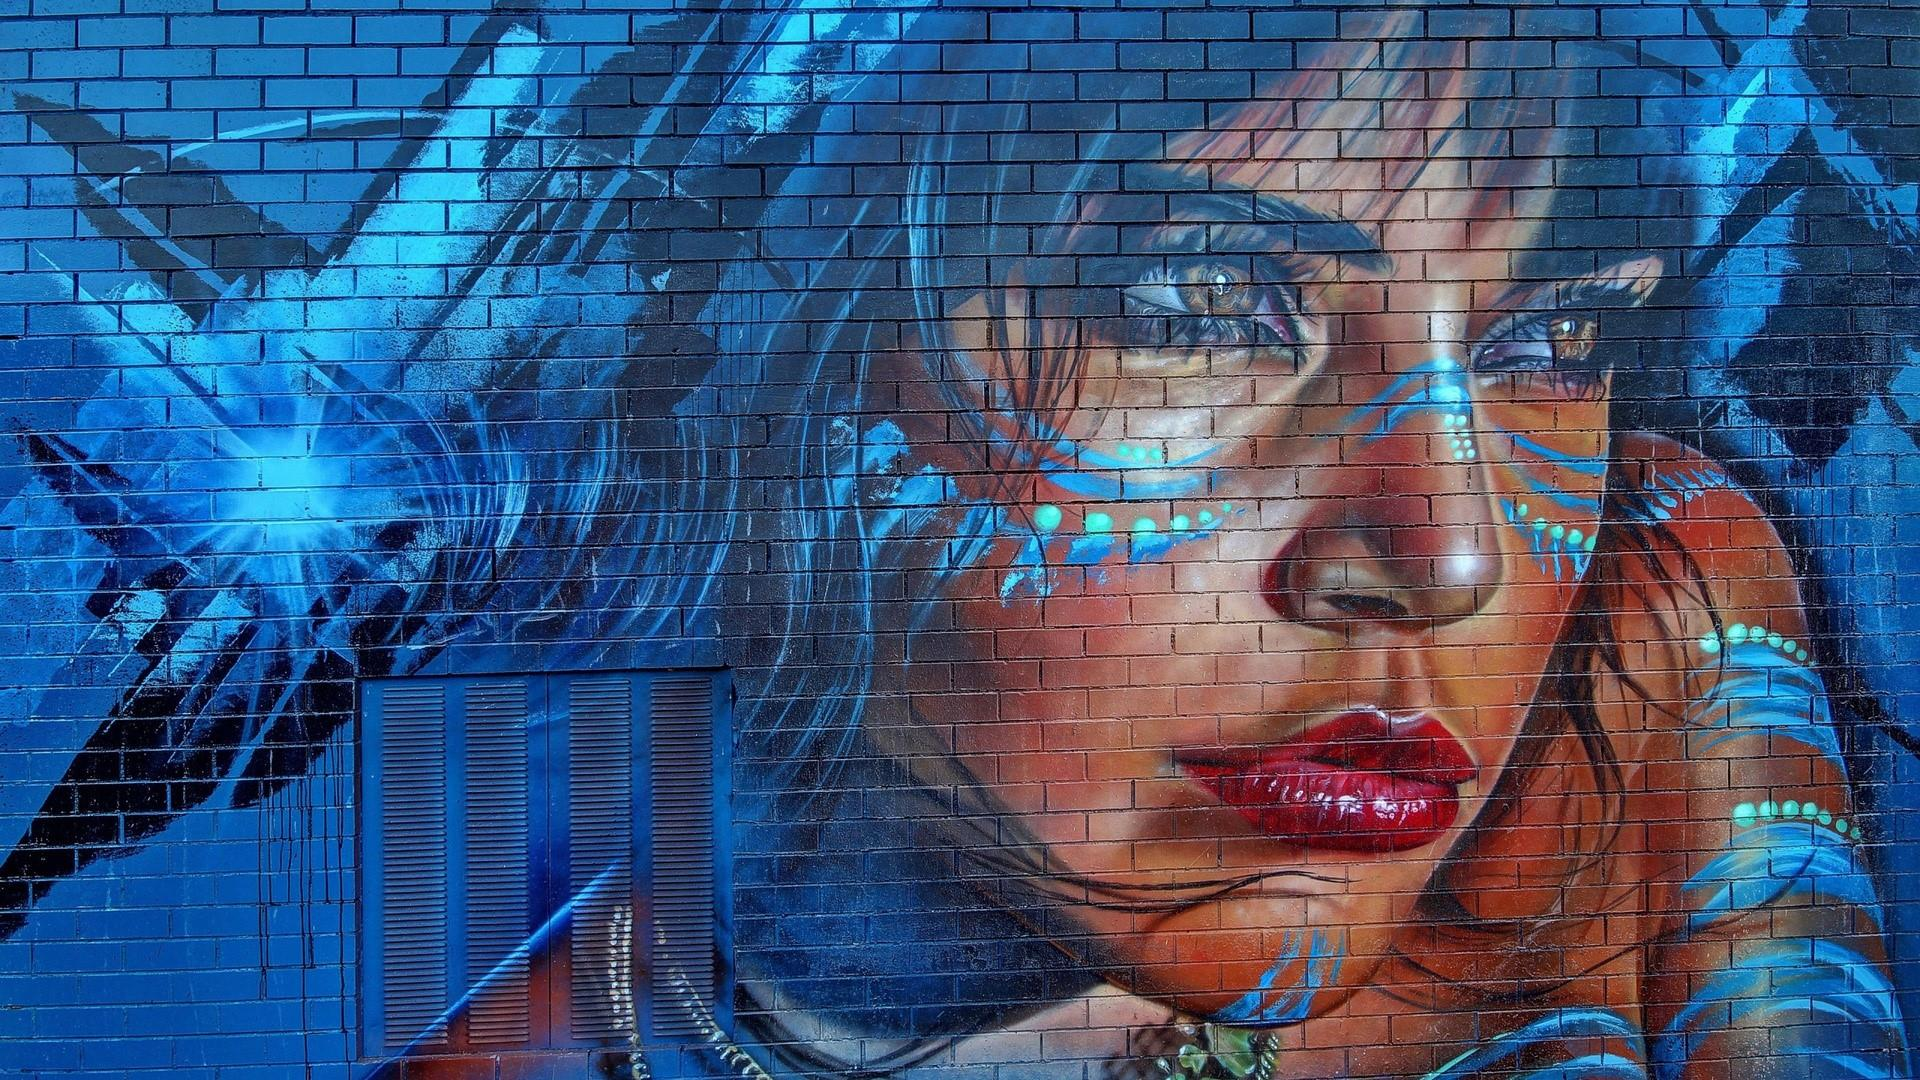 street art wallpaper hd free